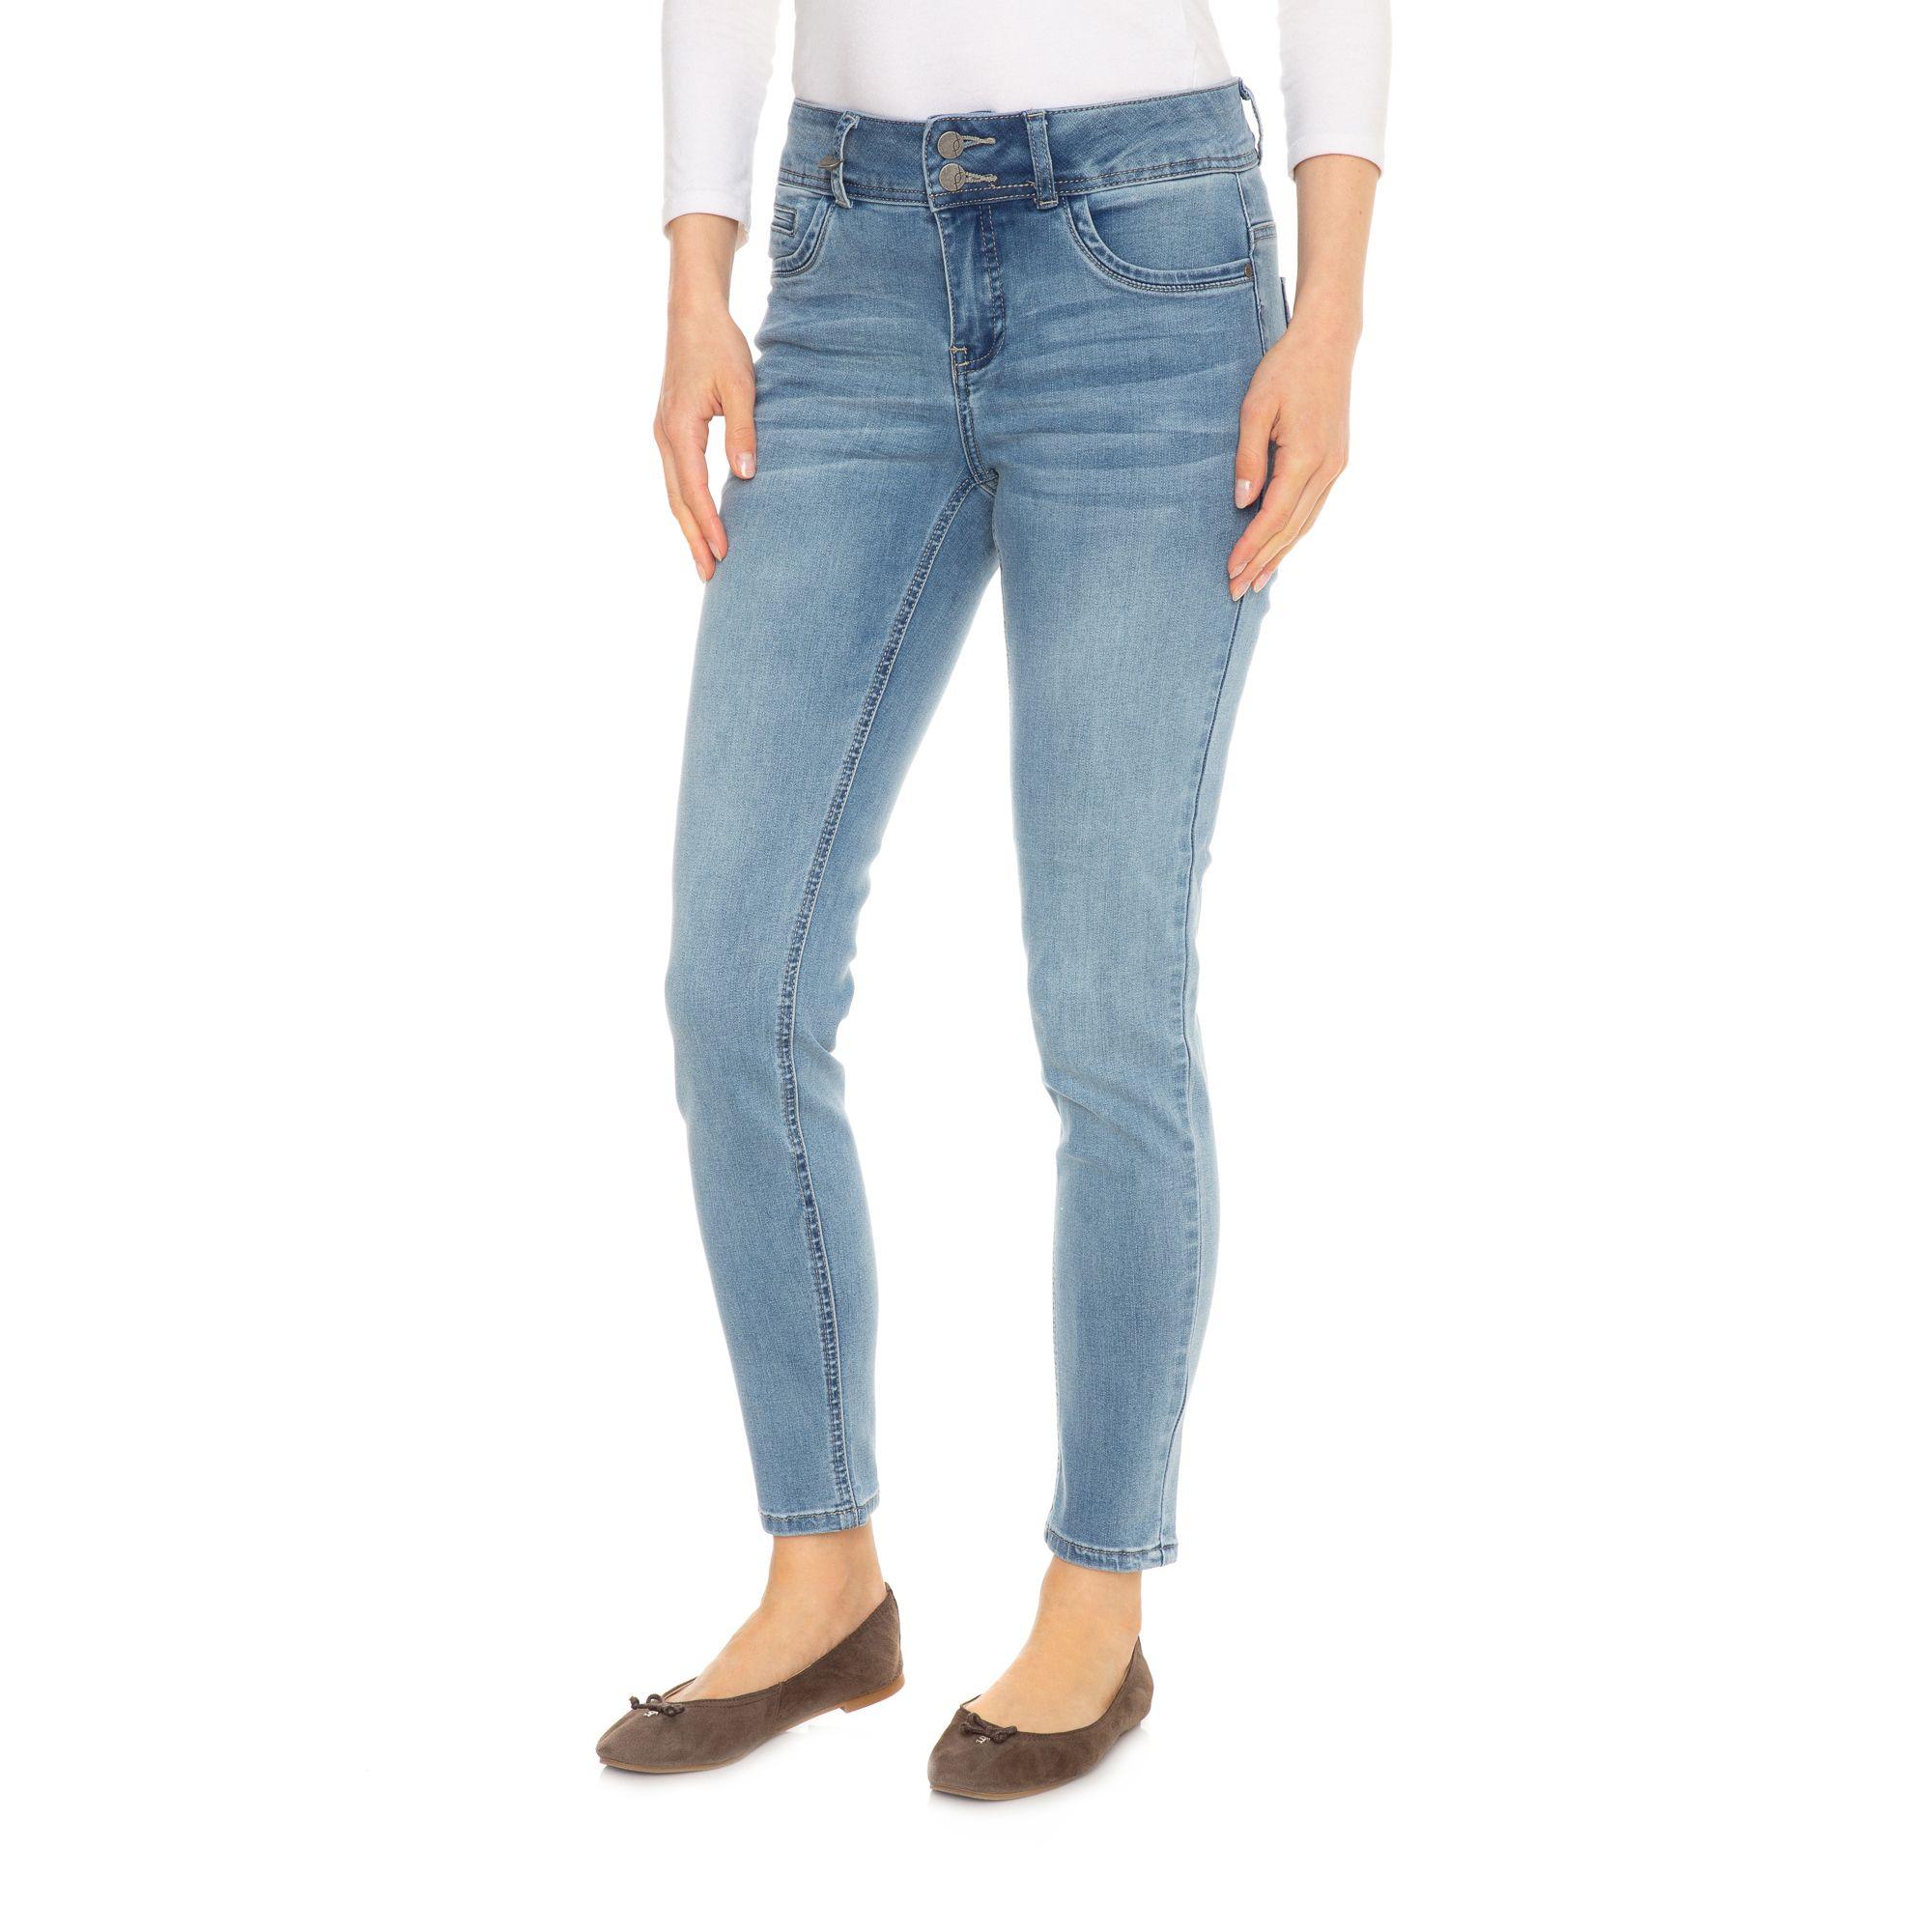 9fff15b2c093 fransa® Jeanshose knöchellang breiter Bund 5-Pocket-Style — QVC.de